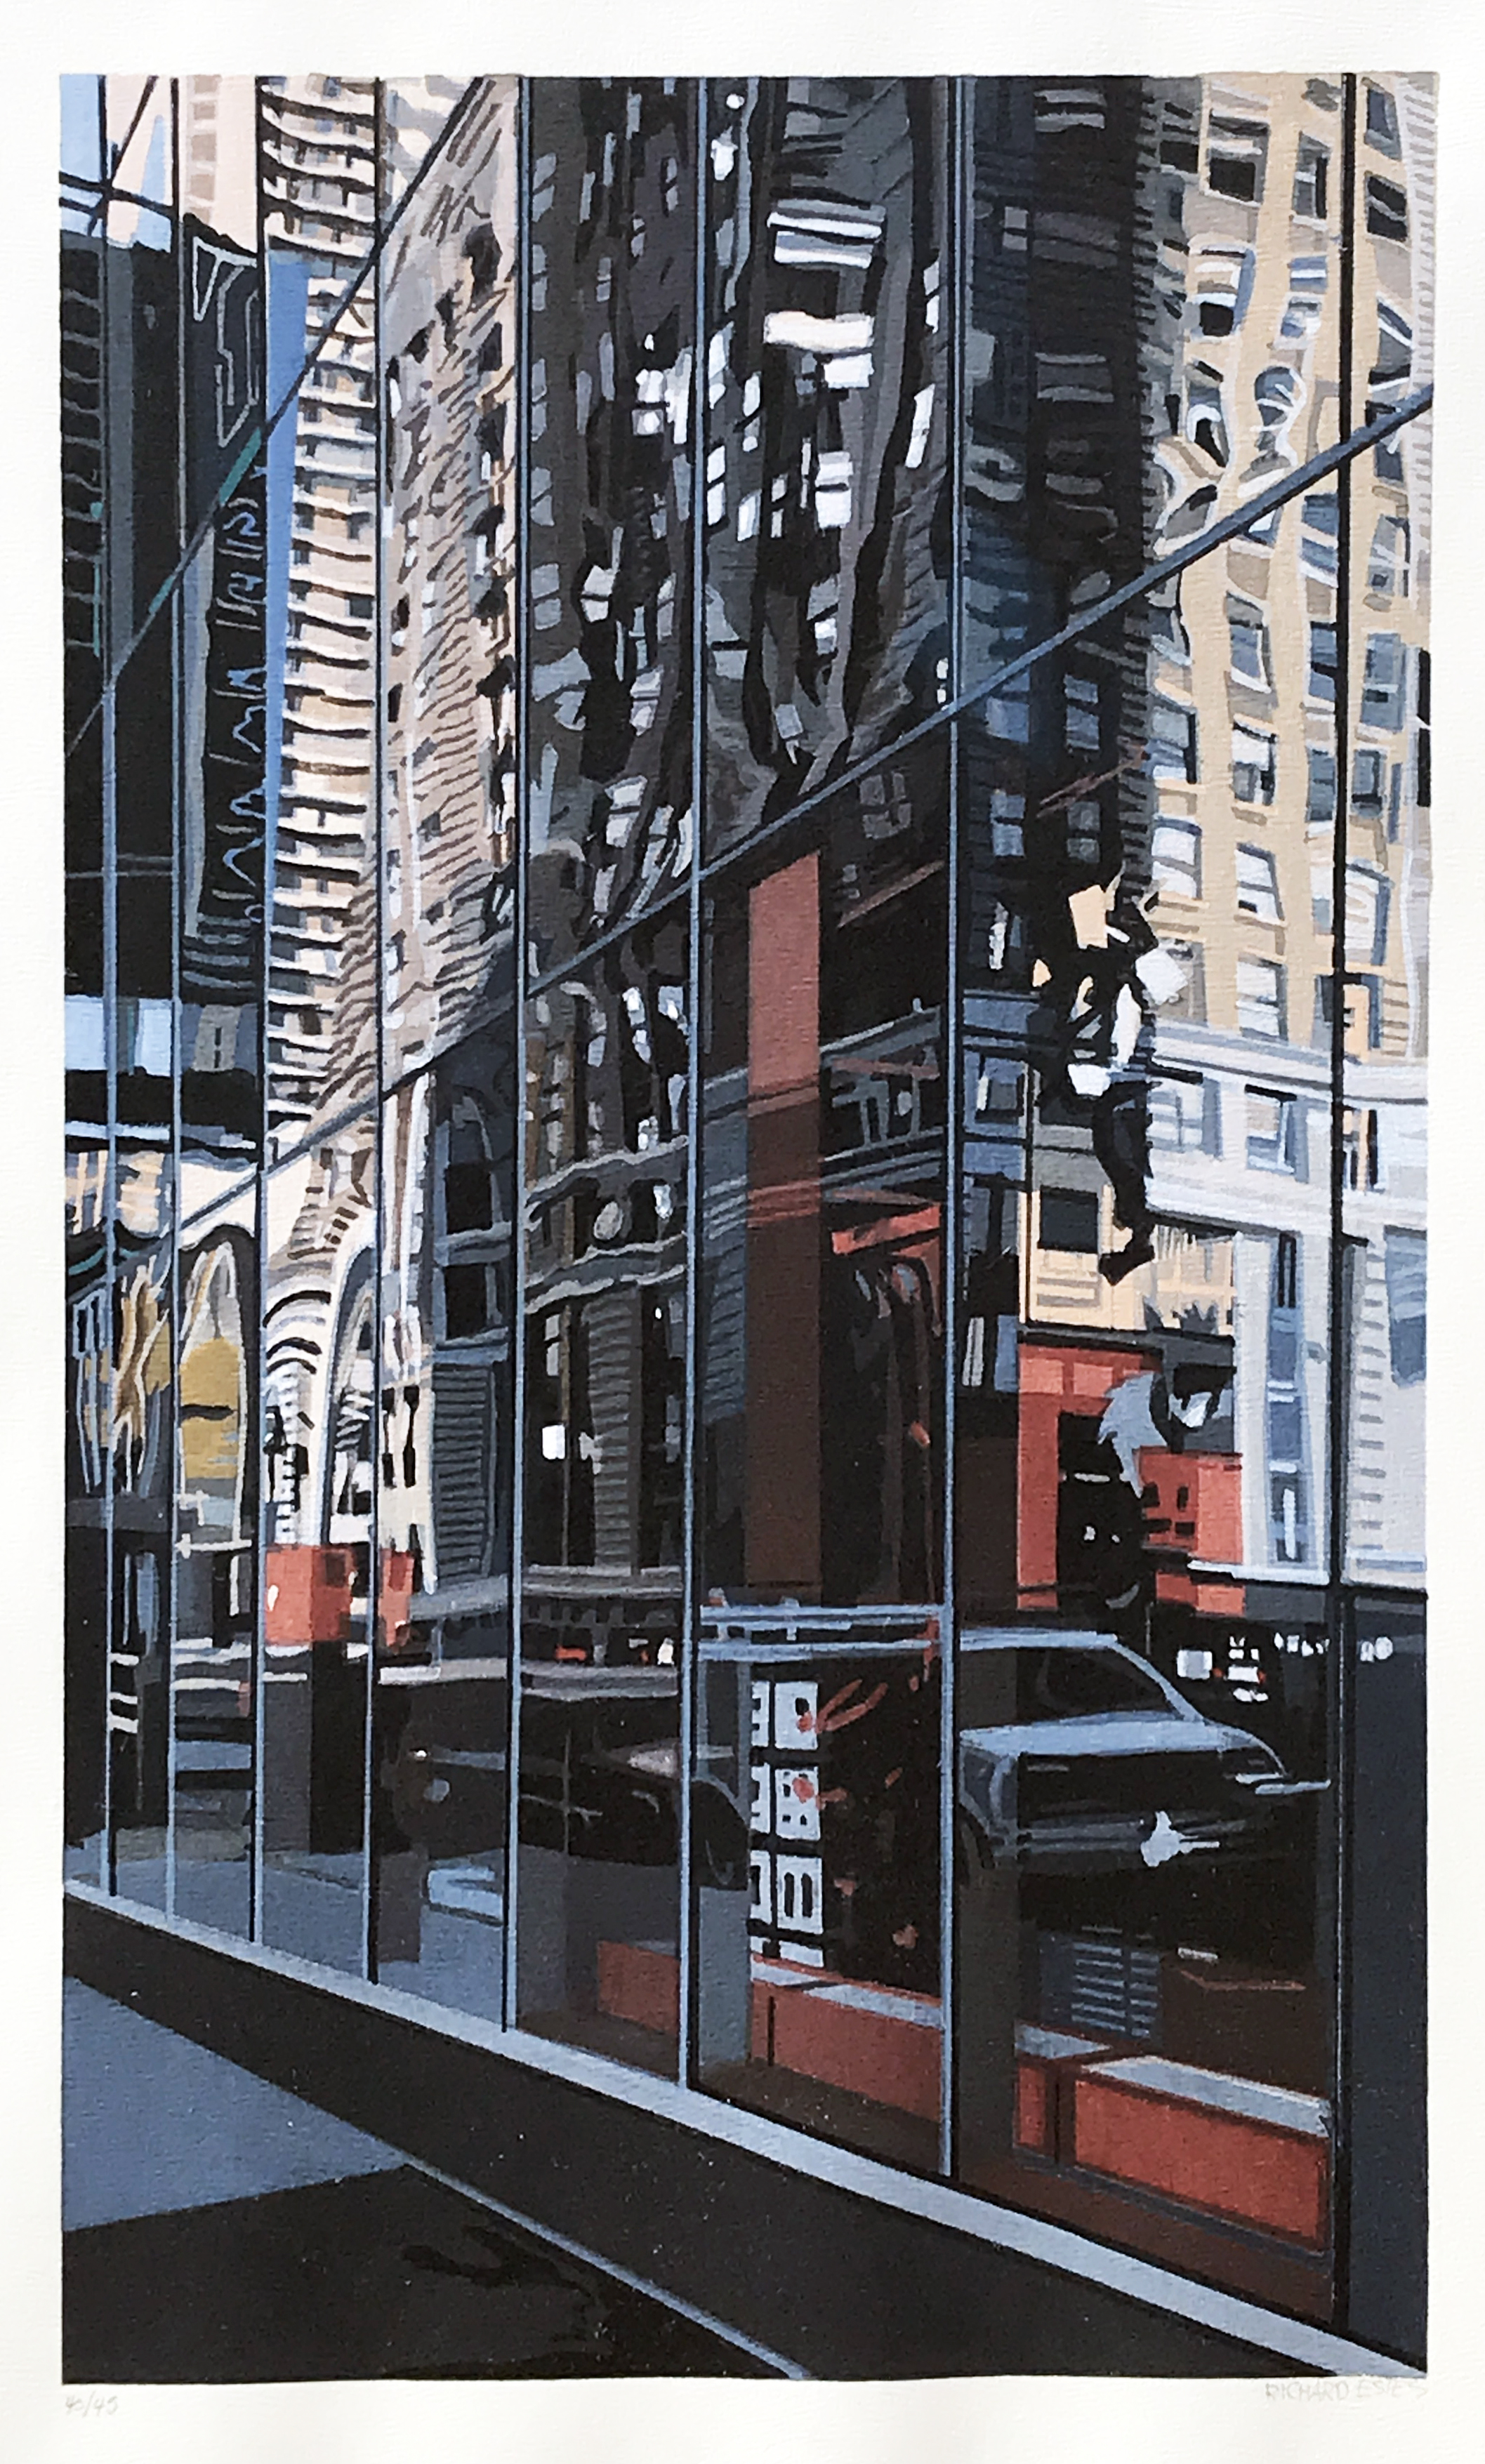 Richard Estes. Times Square, 2000.